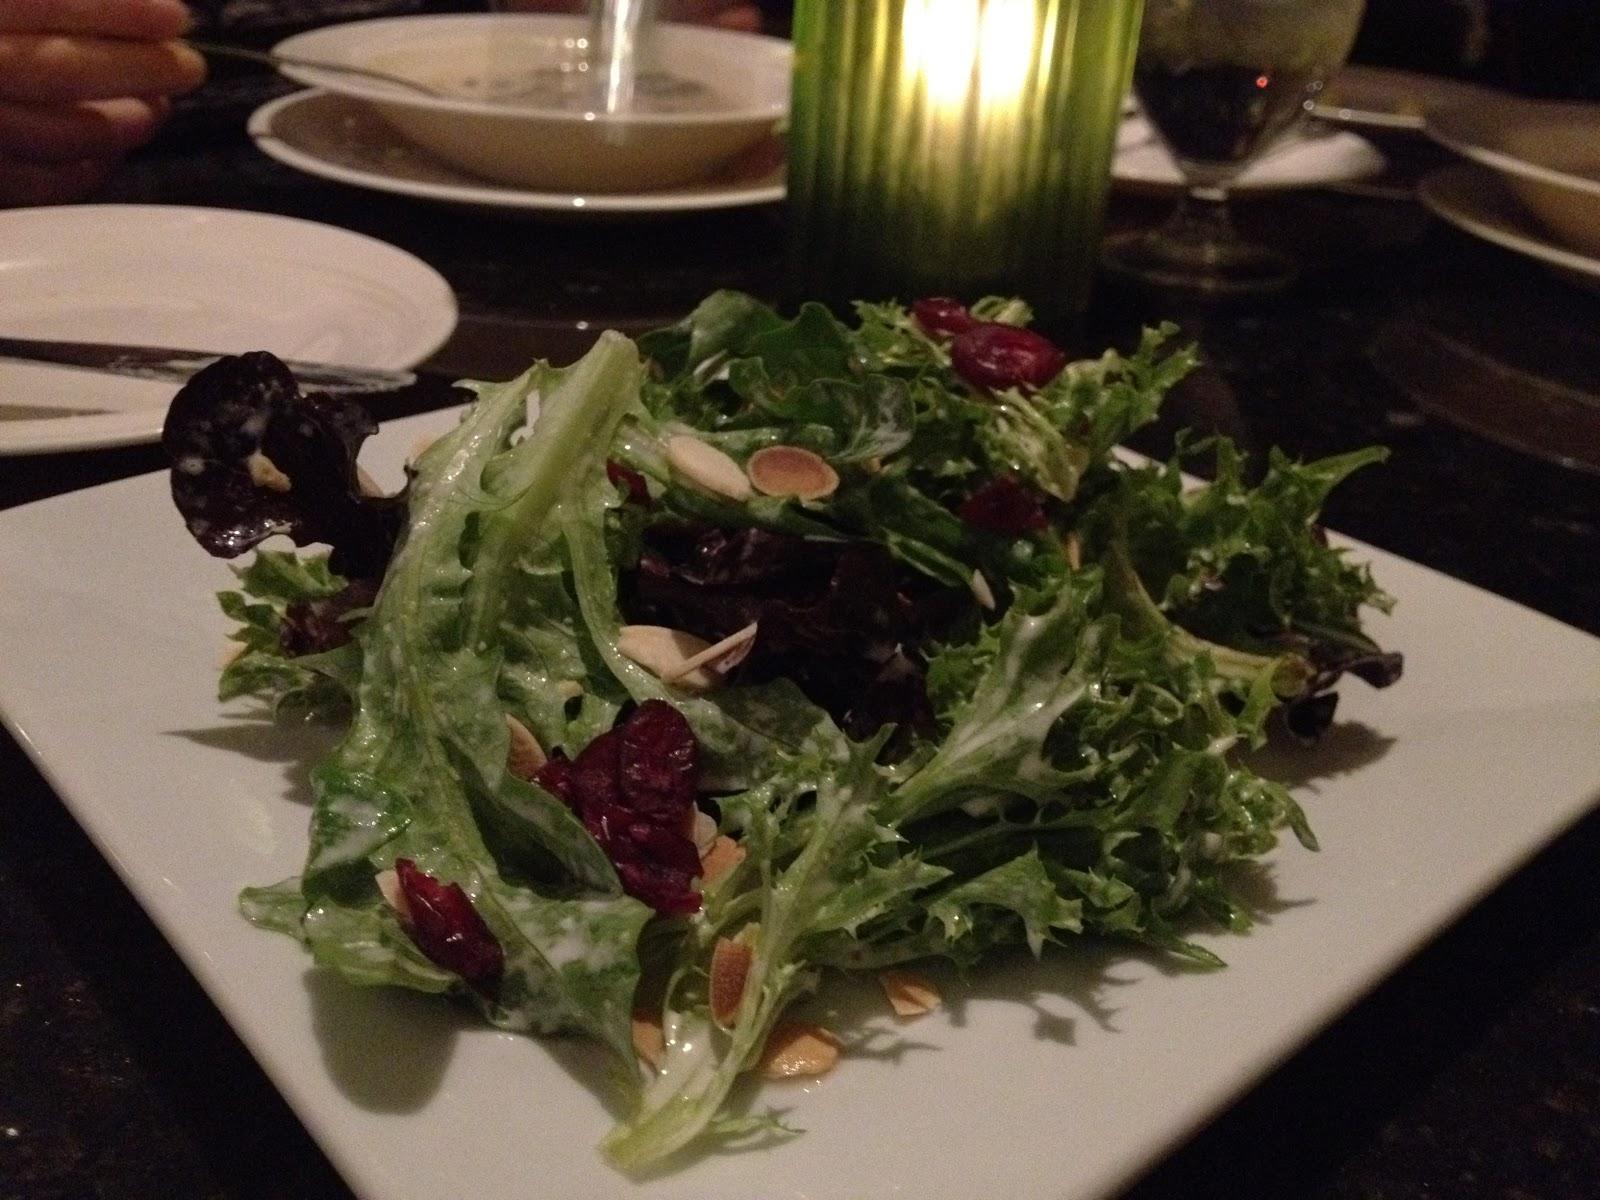 The Academic Chef: Exchange Street Bistro, Malden